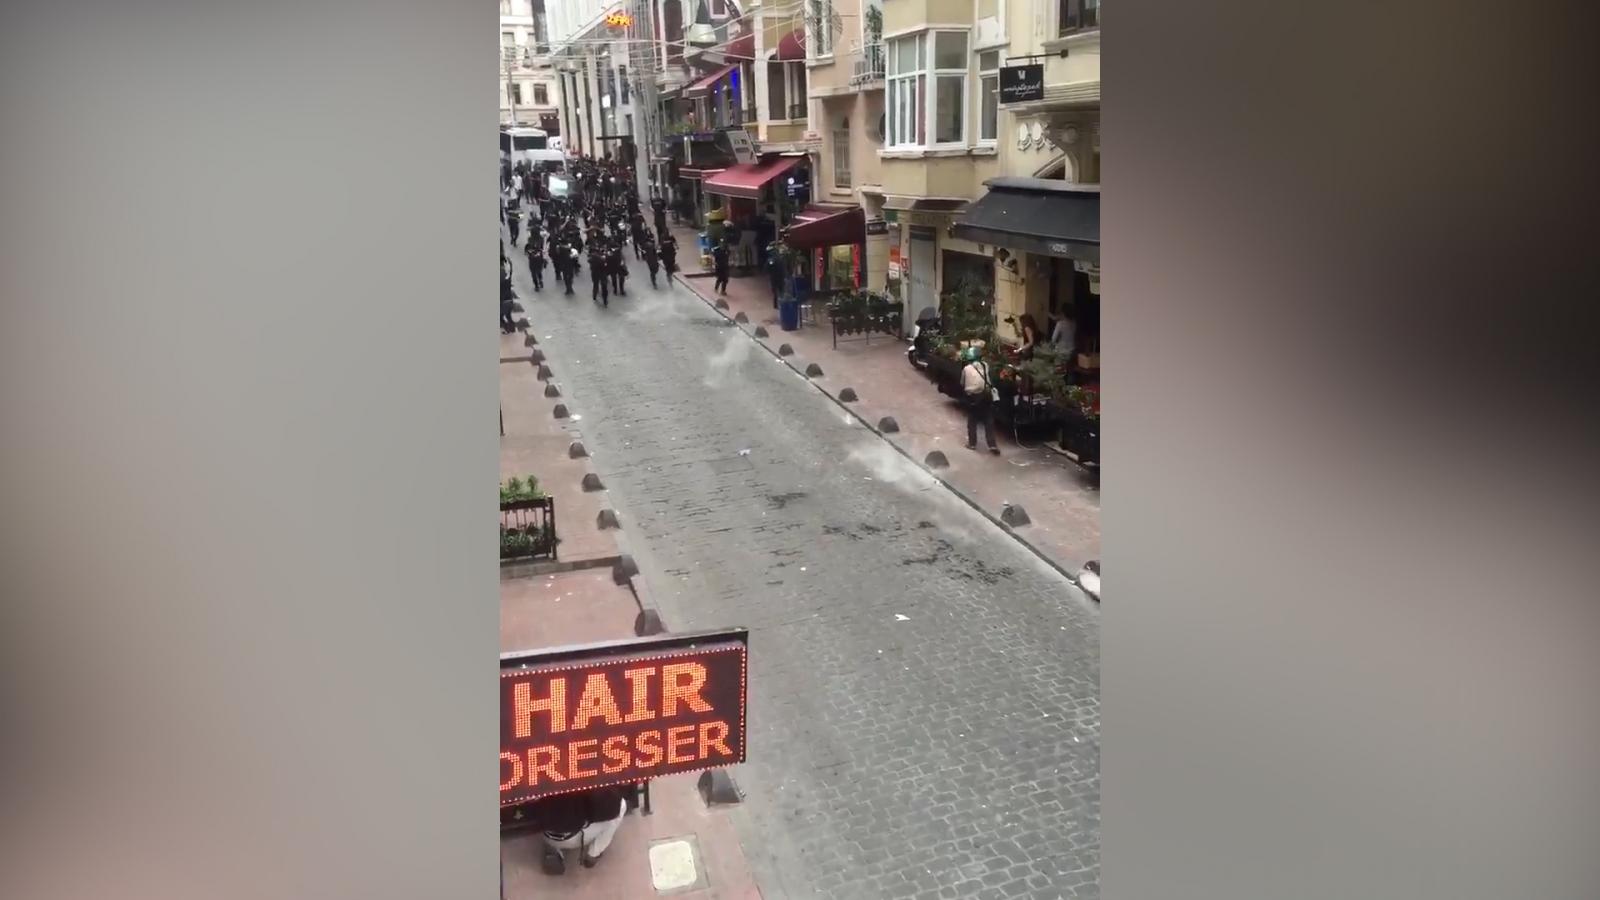 Istanbul gay pride police fire tear gas